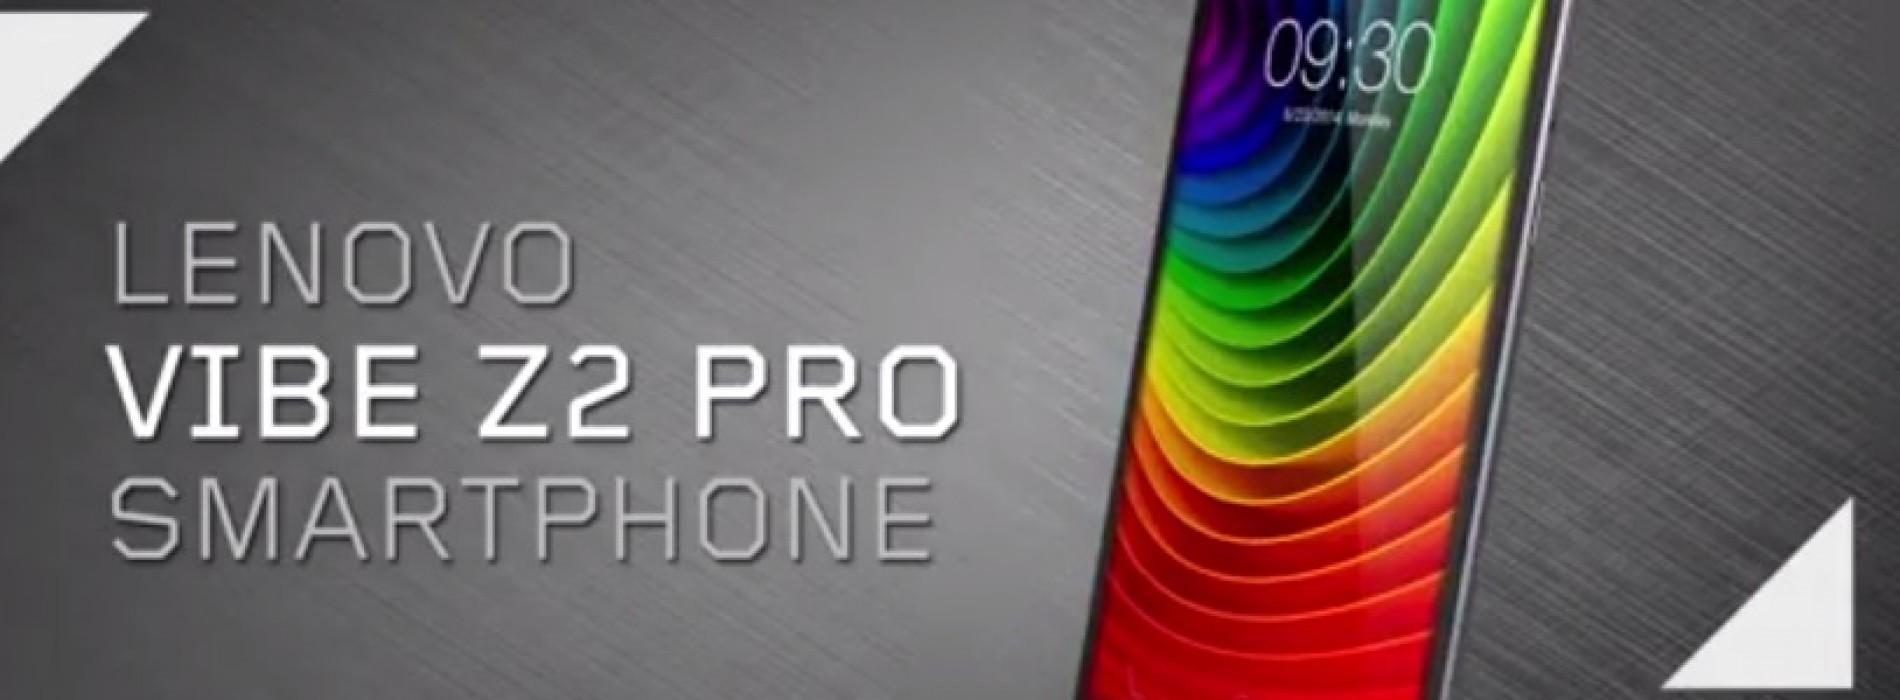 Lenovo Unveils the Vibe Z2 Pro Smartphone